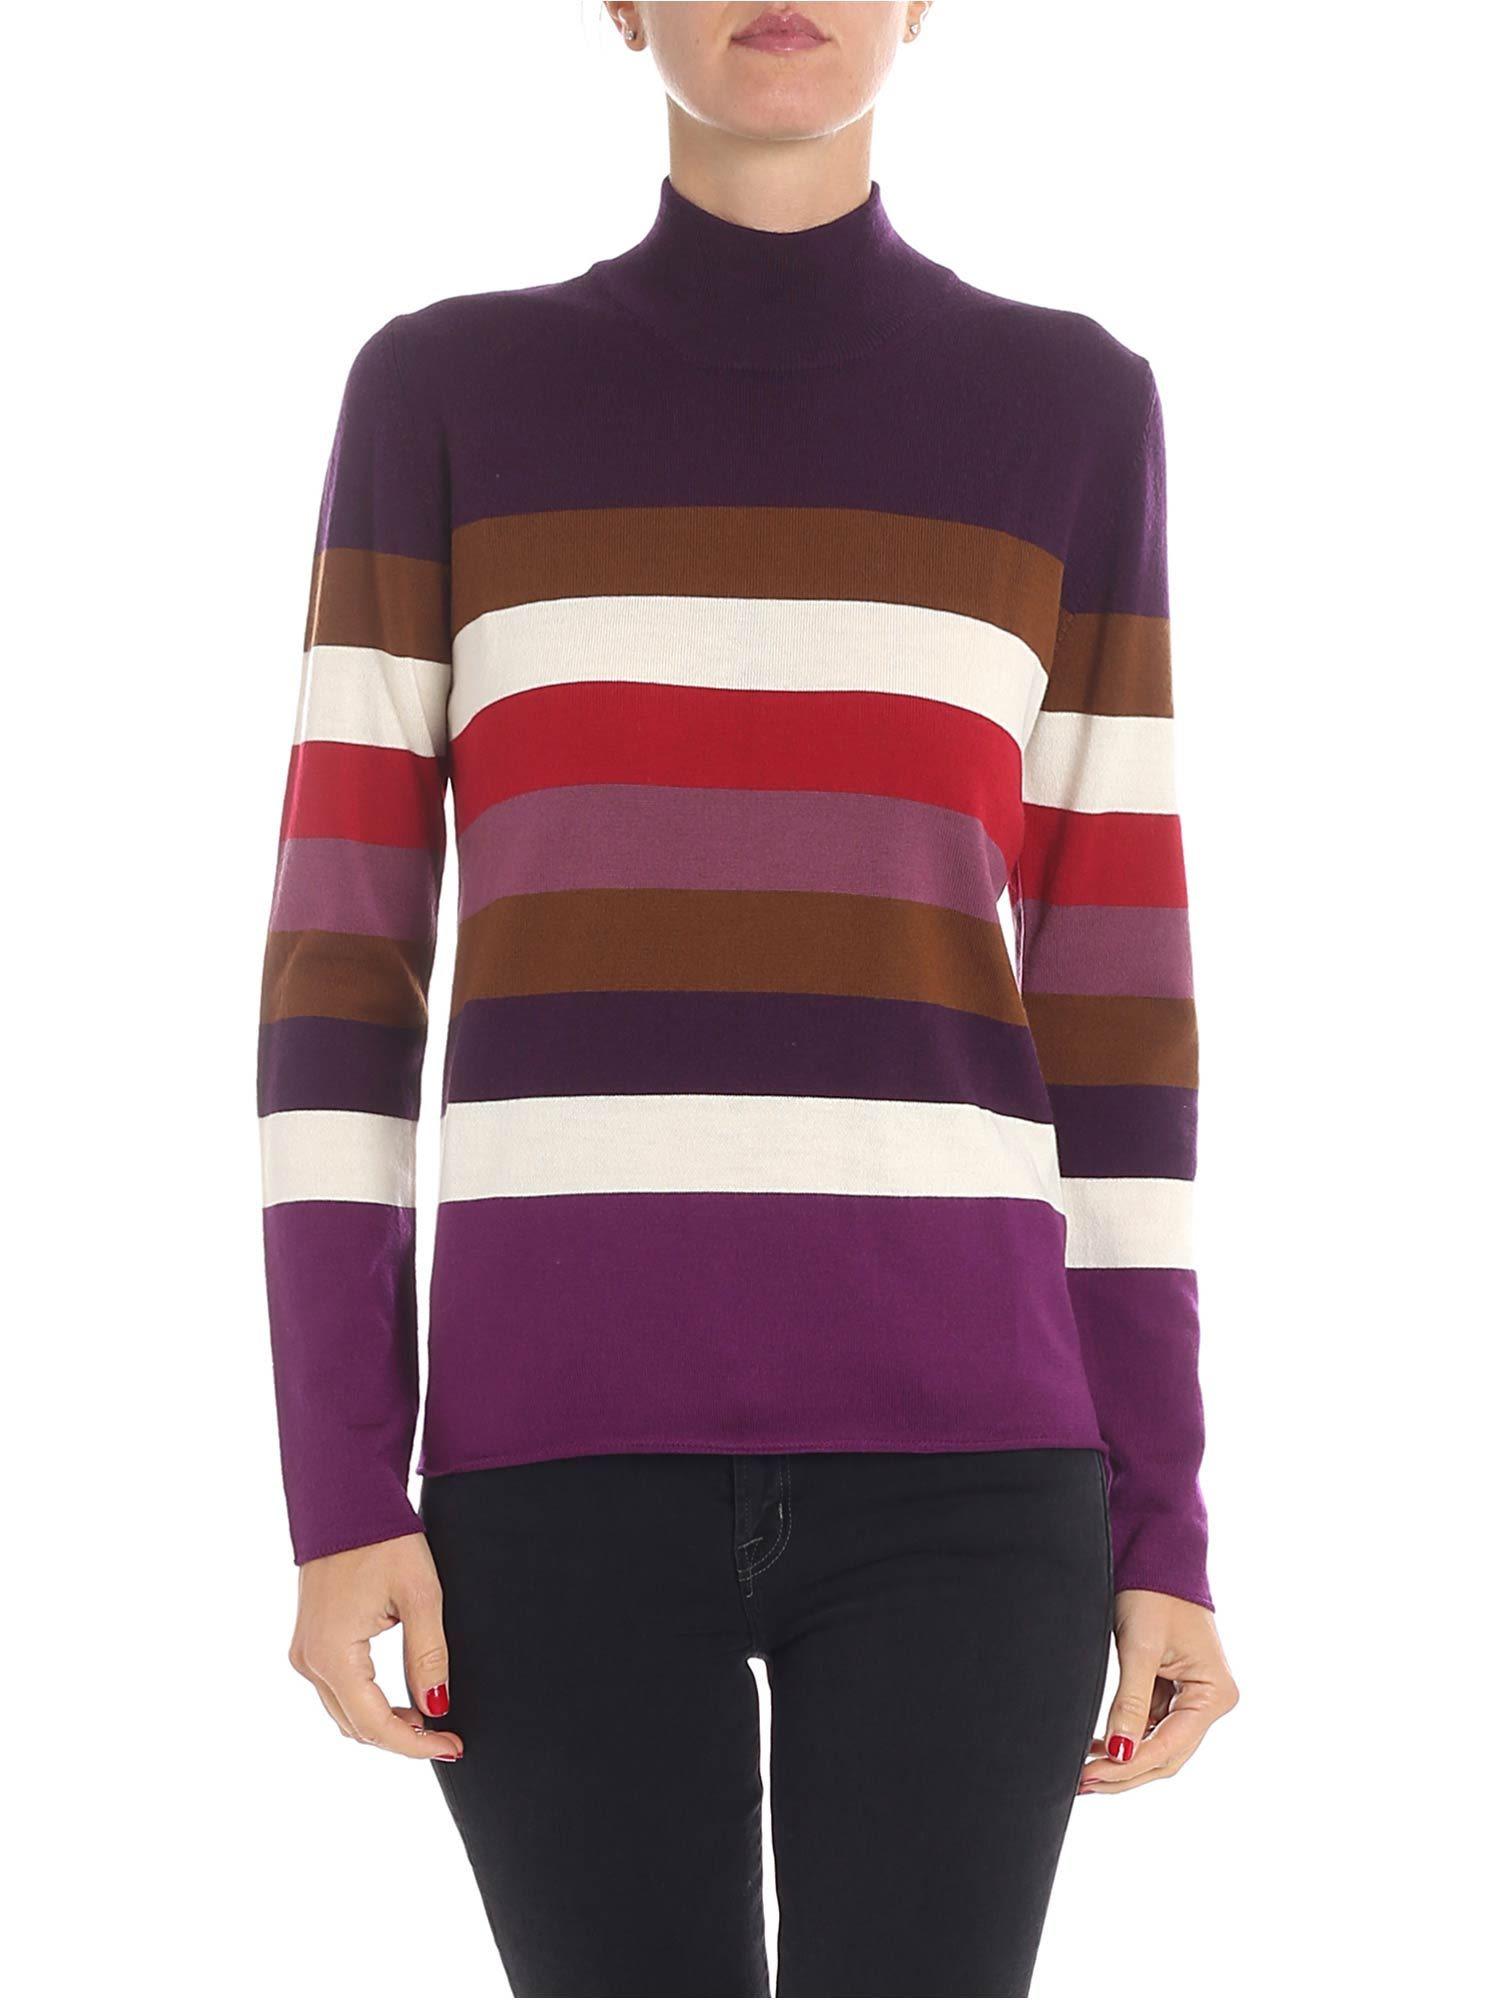 ALTEA Stripe Knit Pullover in Violet